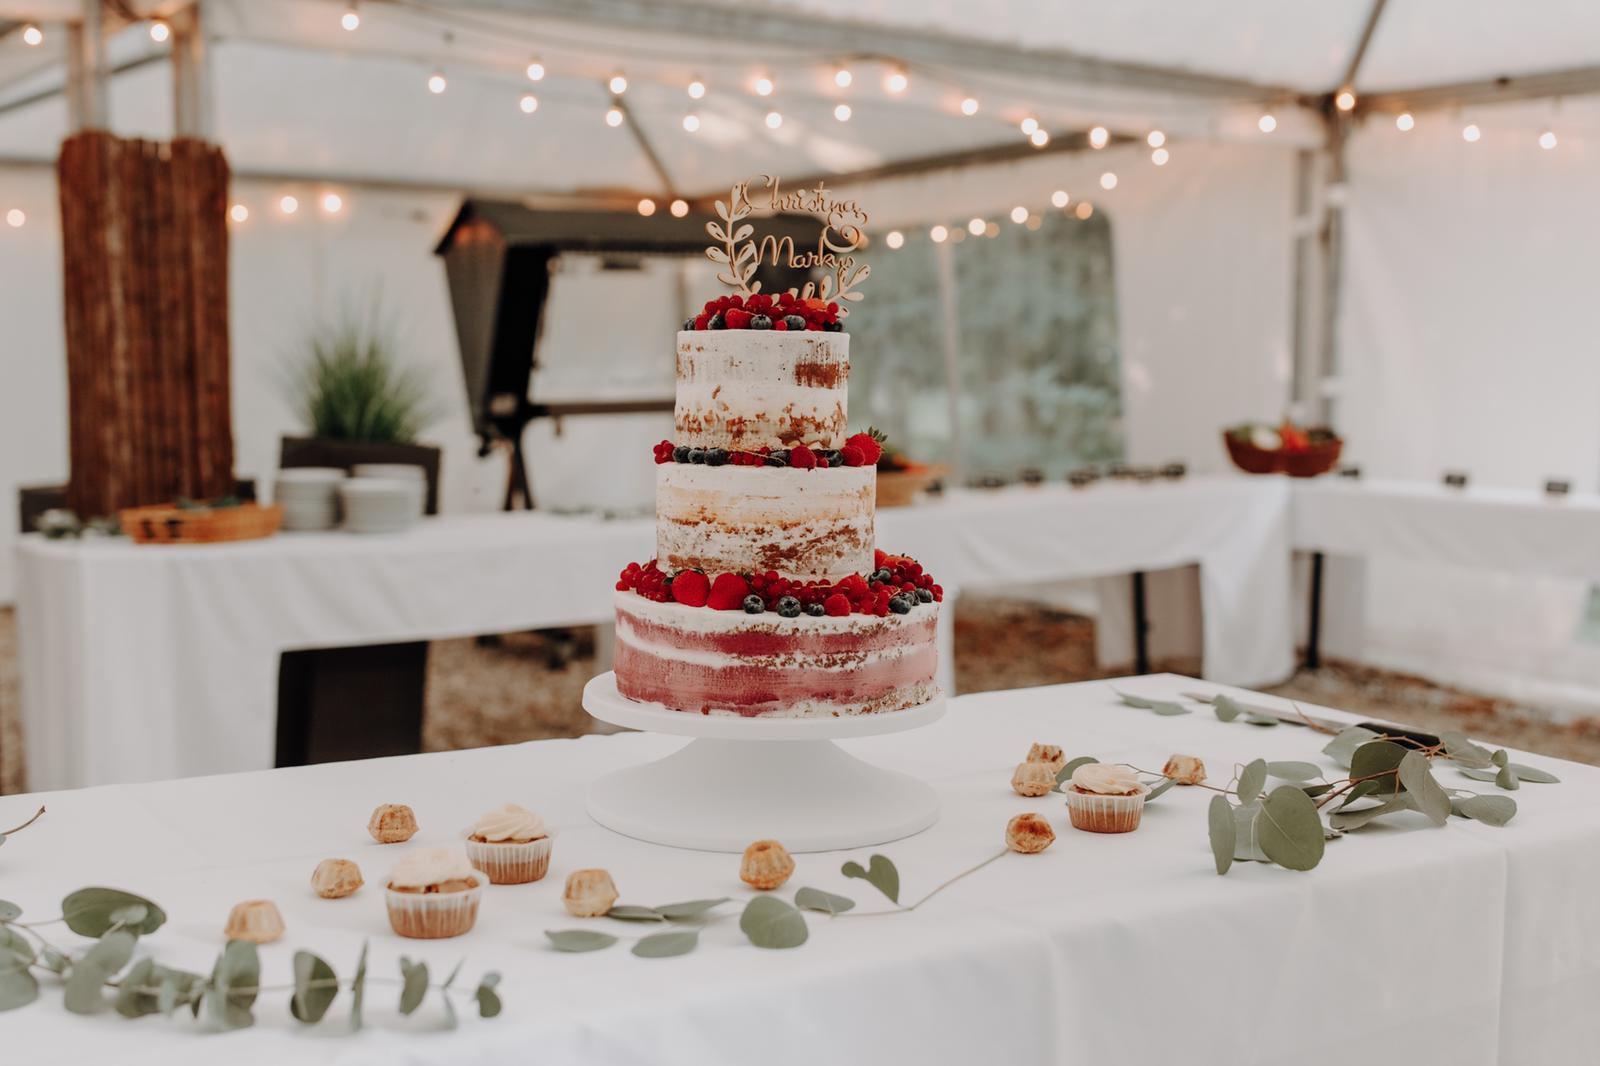 Naked Cake Hochzeit.jpeg